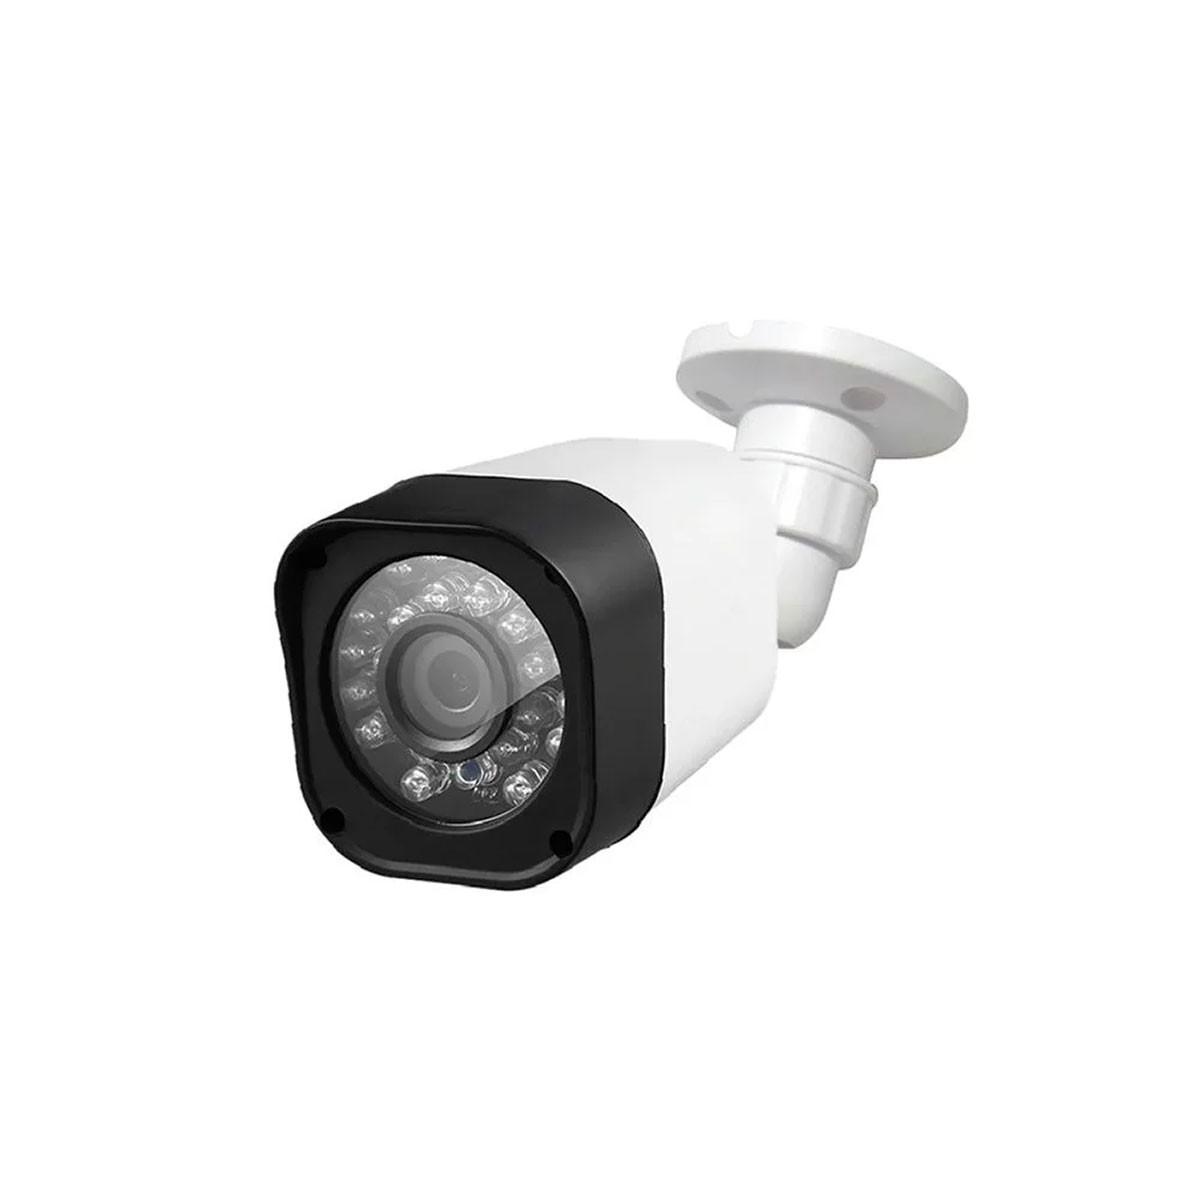 Kit 5 Cameras Infra Full Hd 1080p Bullet Externa